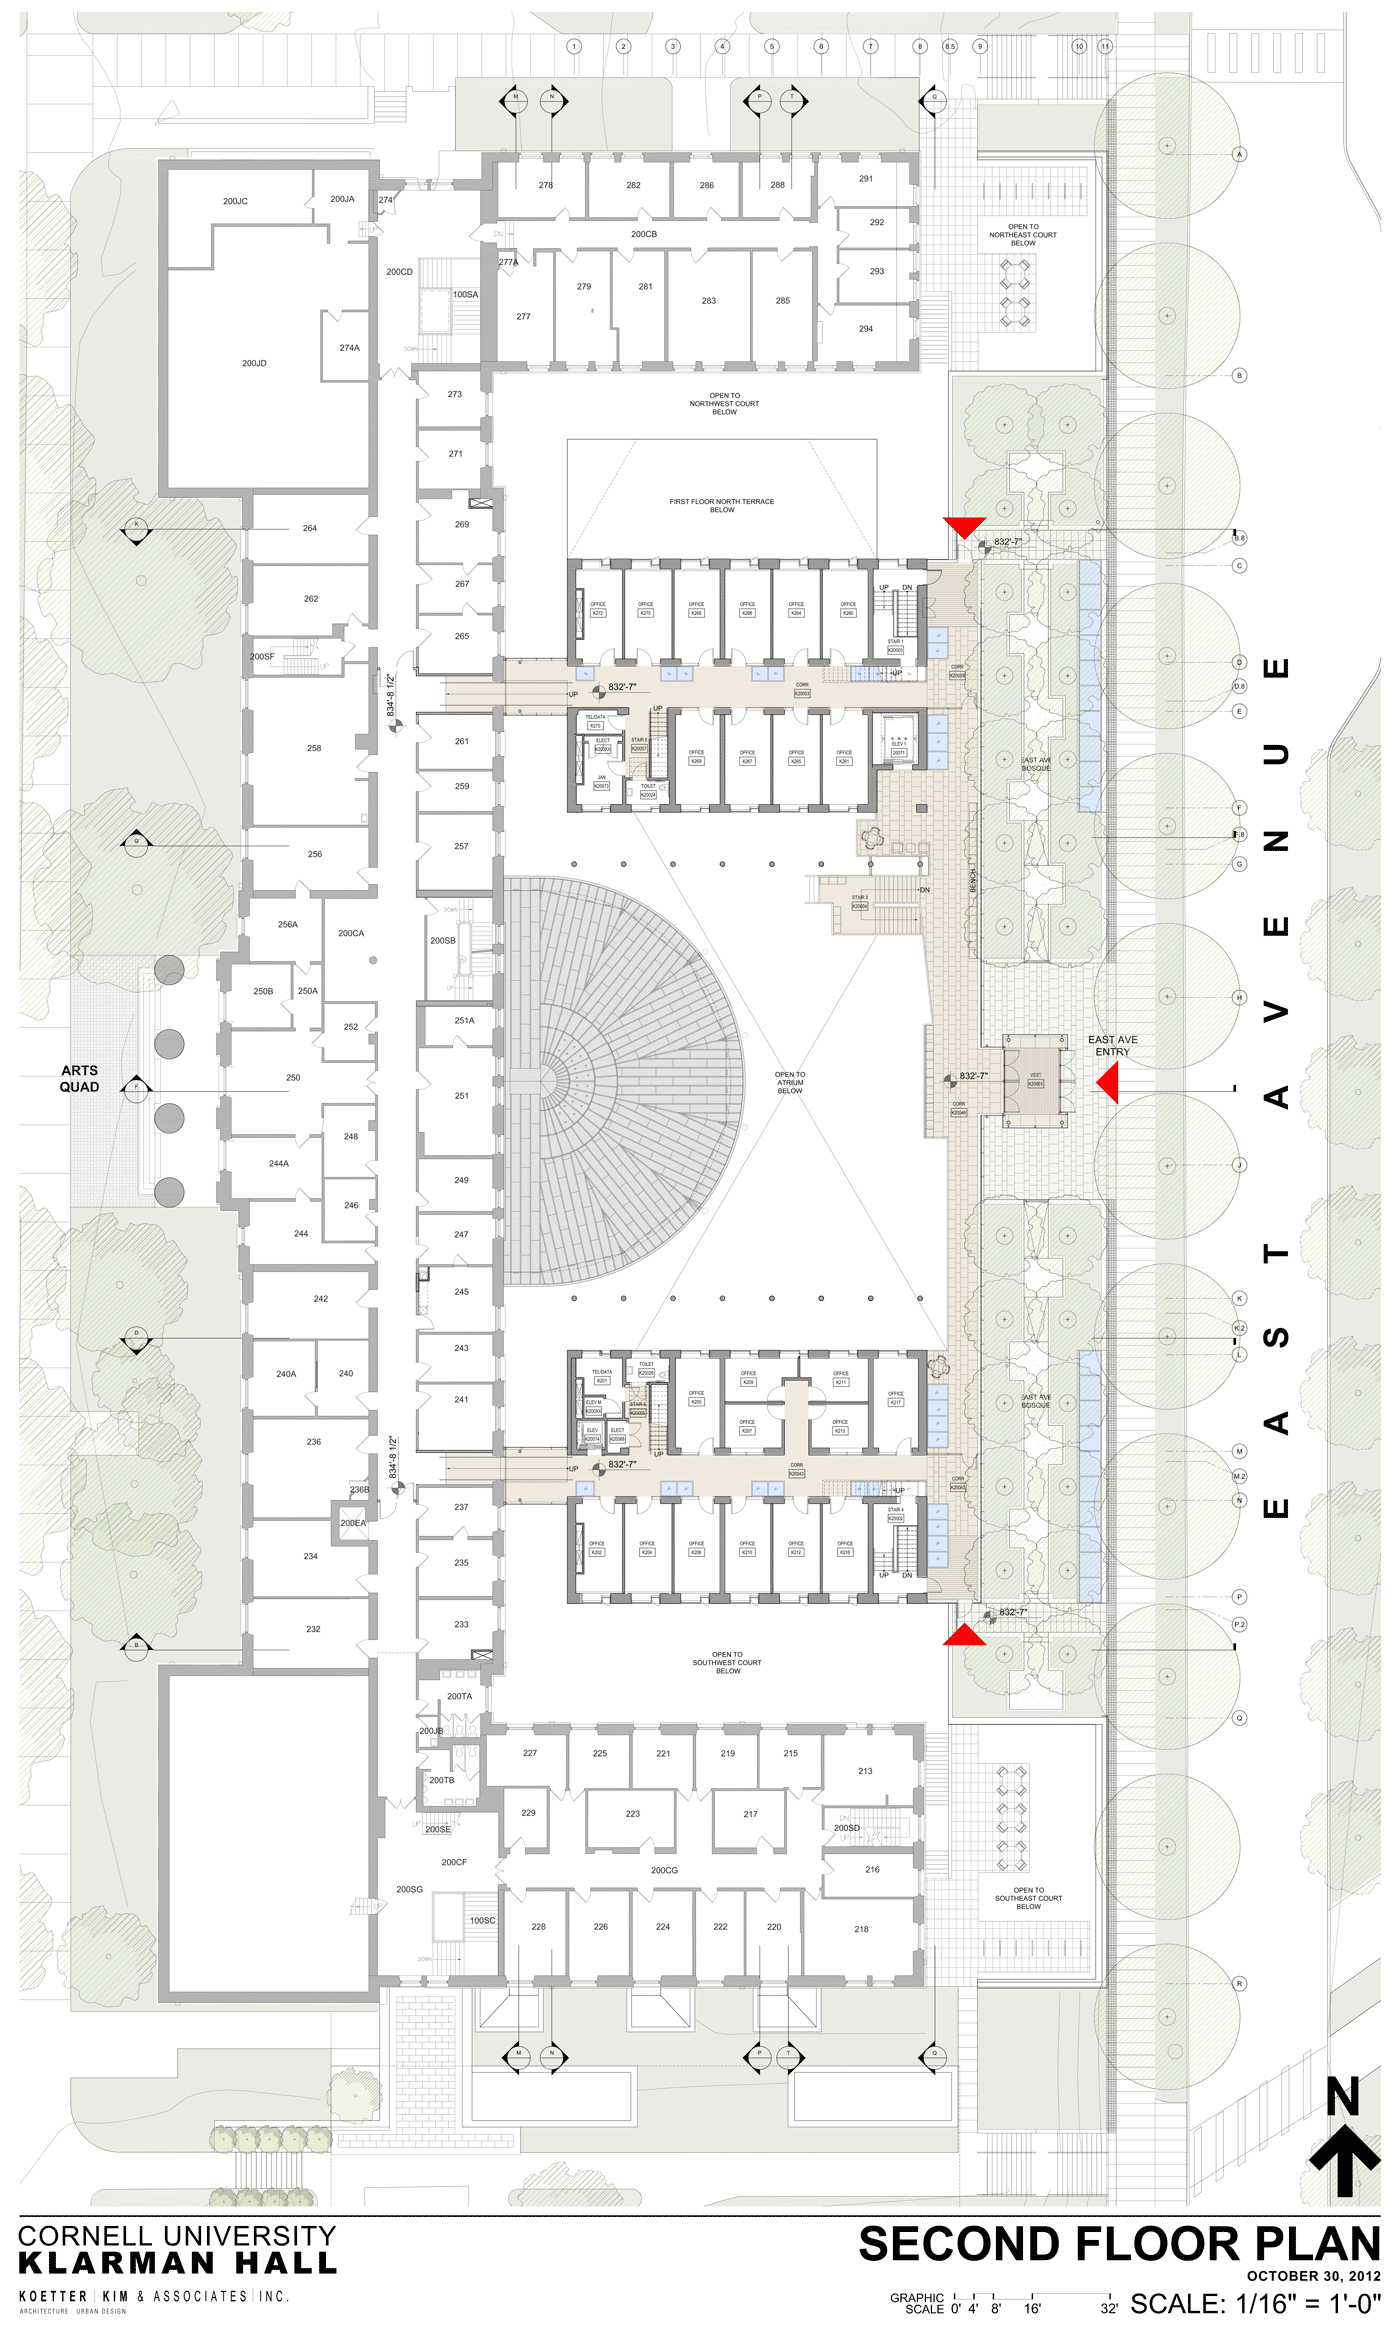 klarman-hall-floor-plans-3-re